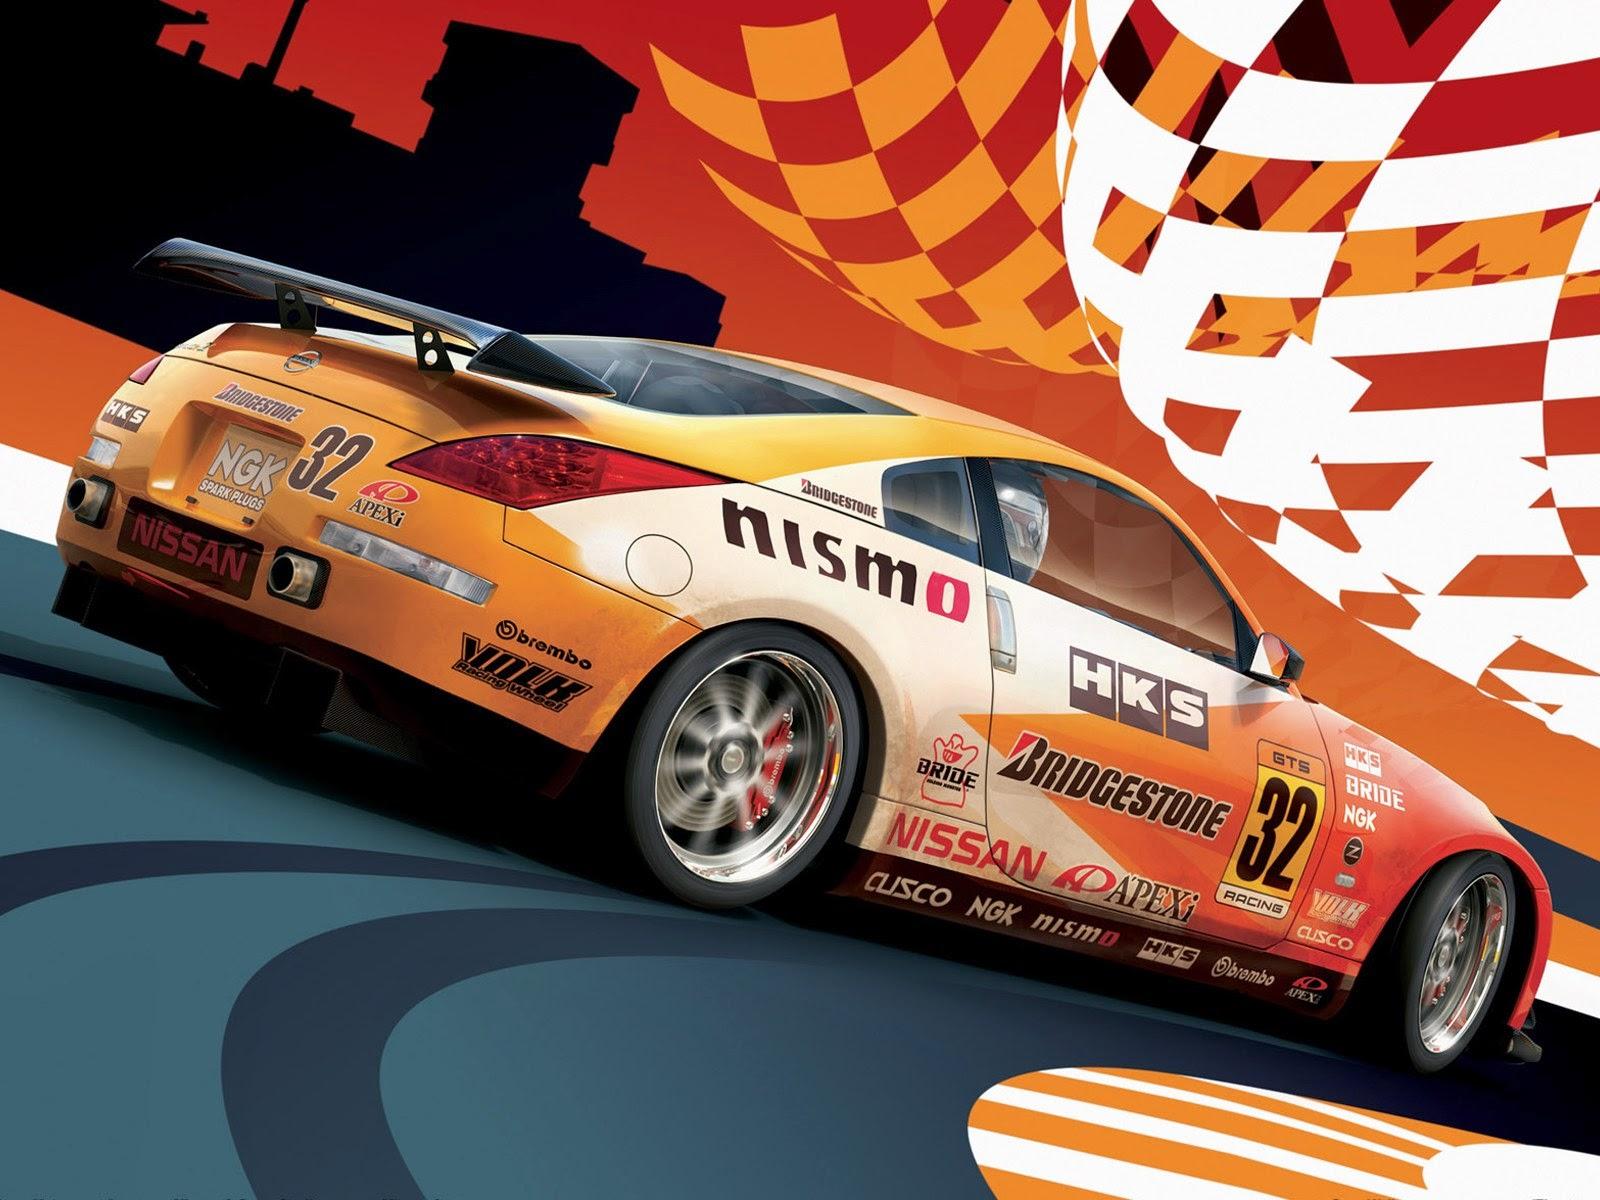 car walpaper Cool Race Car Wallpapers From Games Desktop 1600x1200